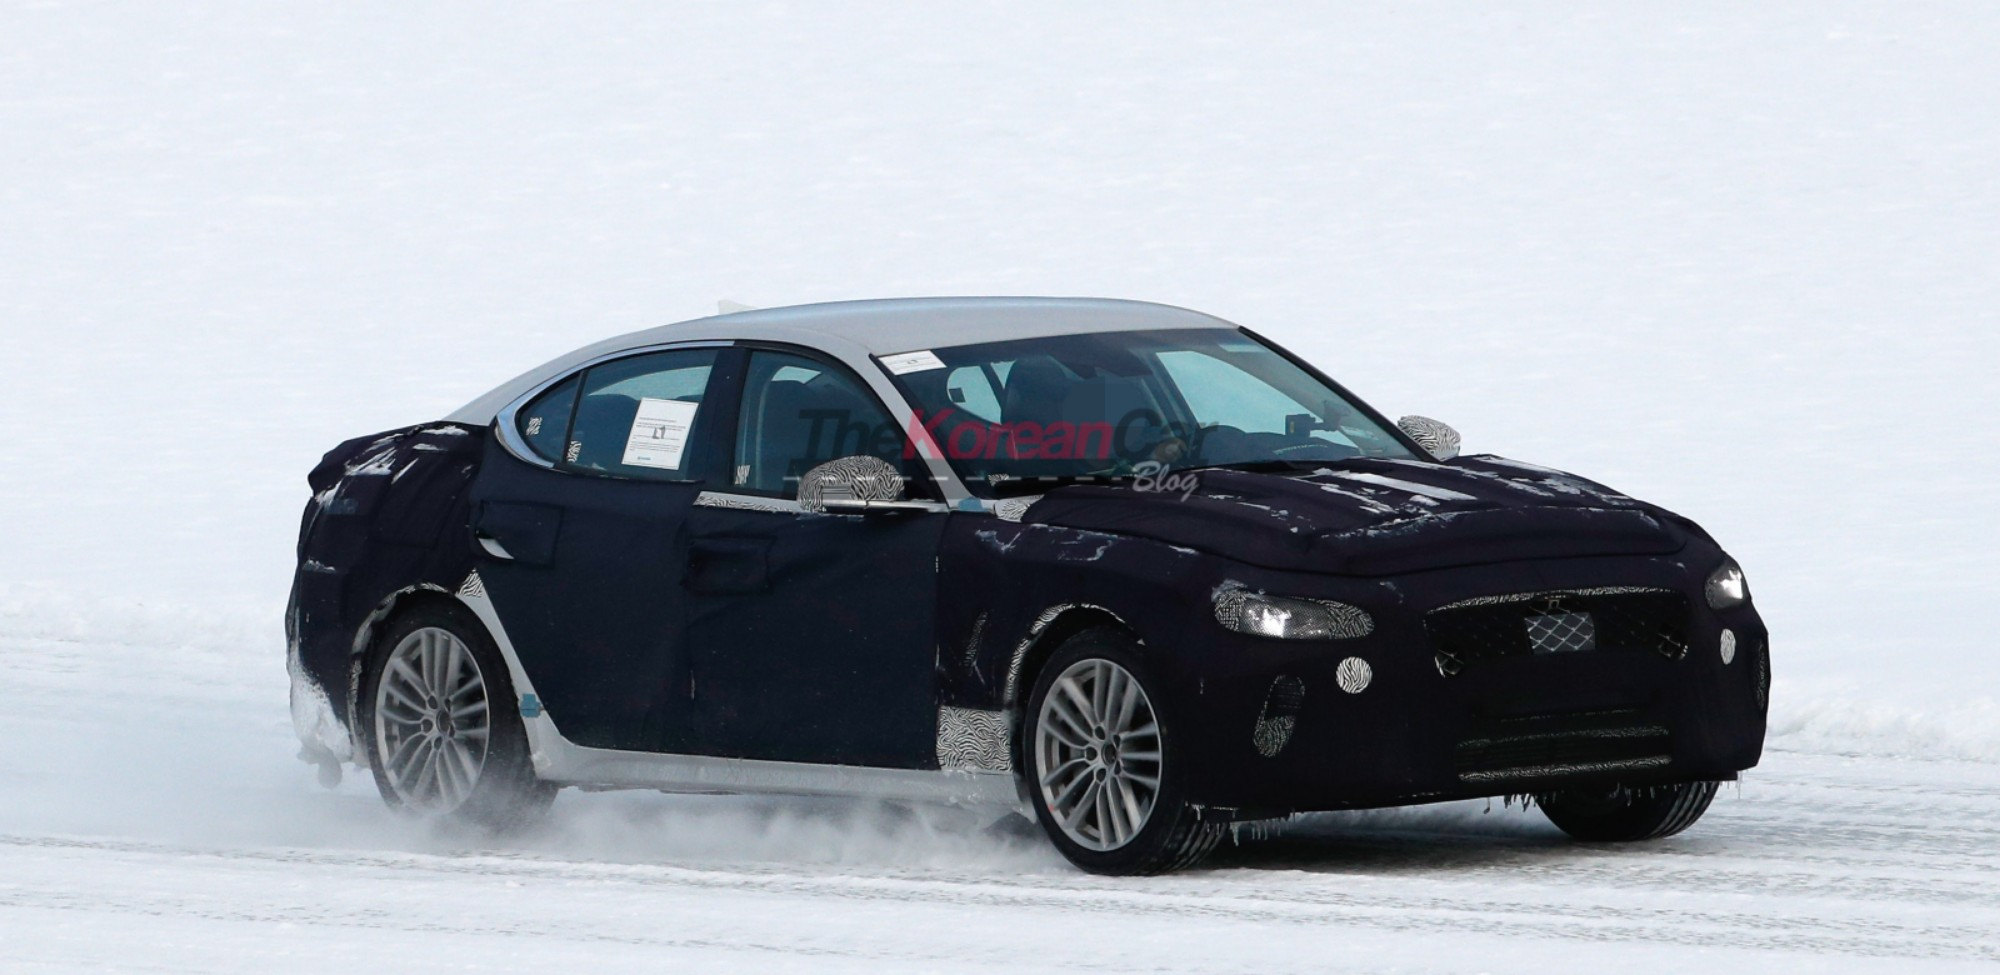 New Winter Testing Genesis G70 Spyshots!